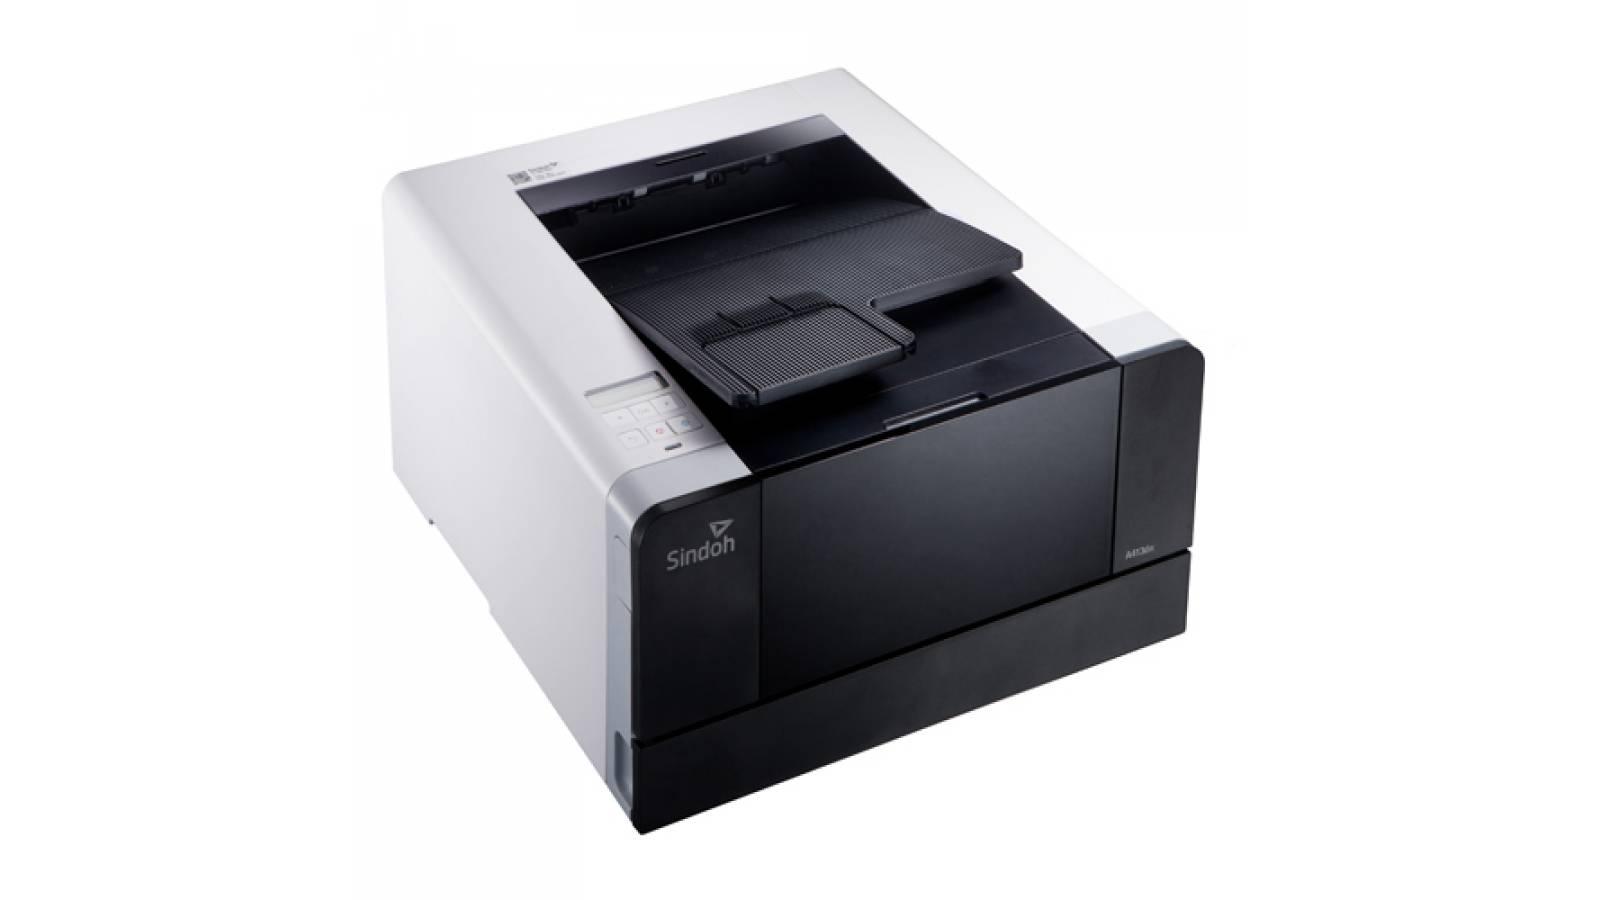 Impresora láser monocromática Sindoh A413